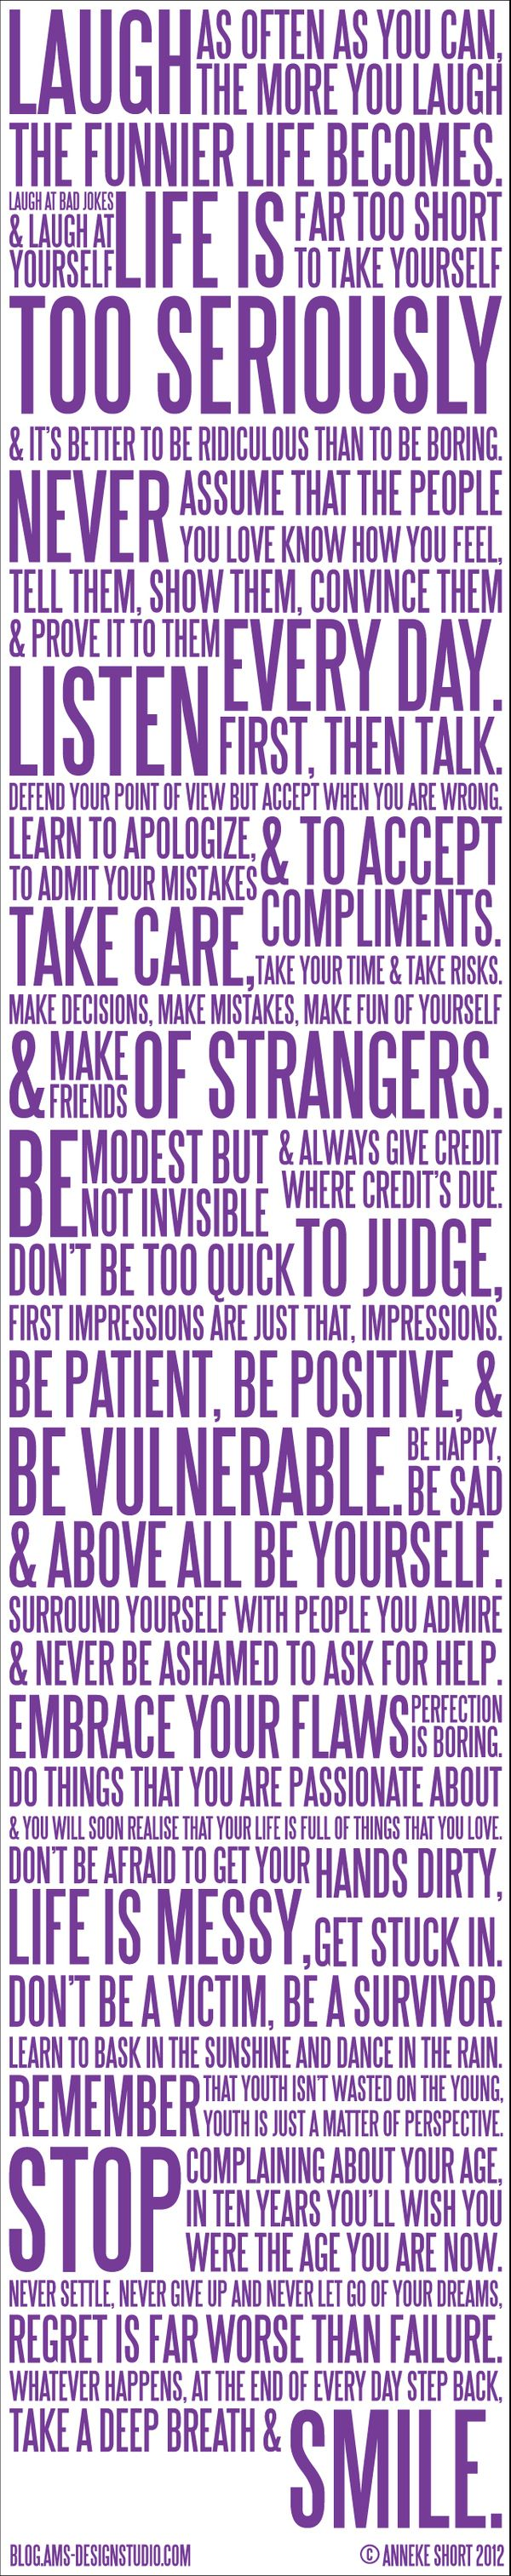 The AMS Manifesto